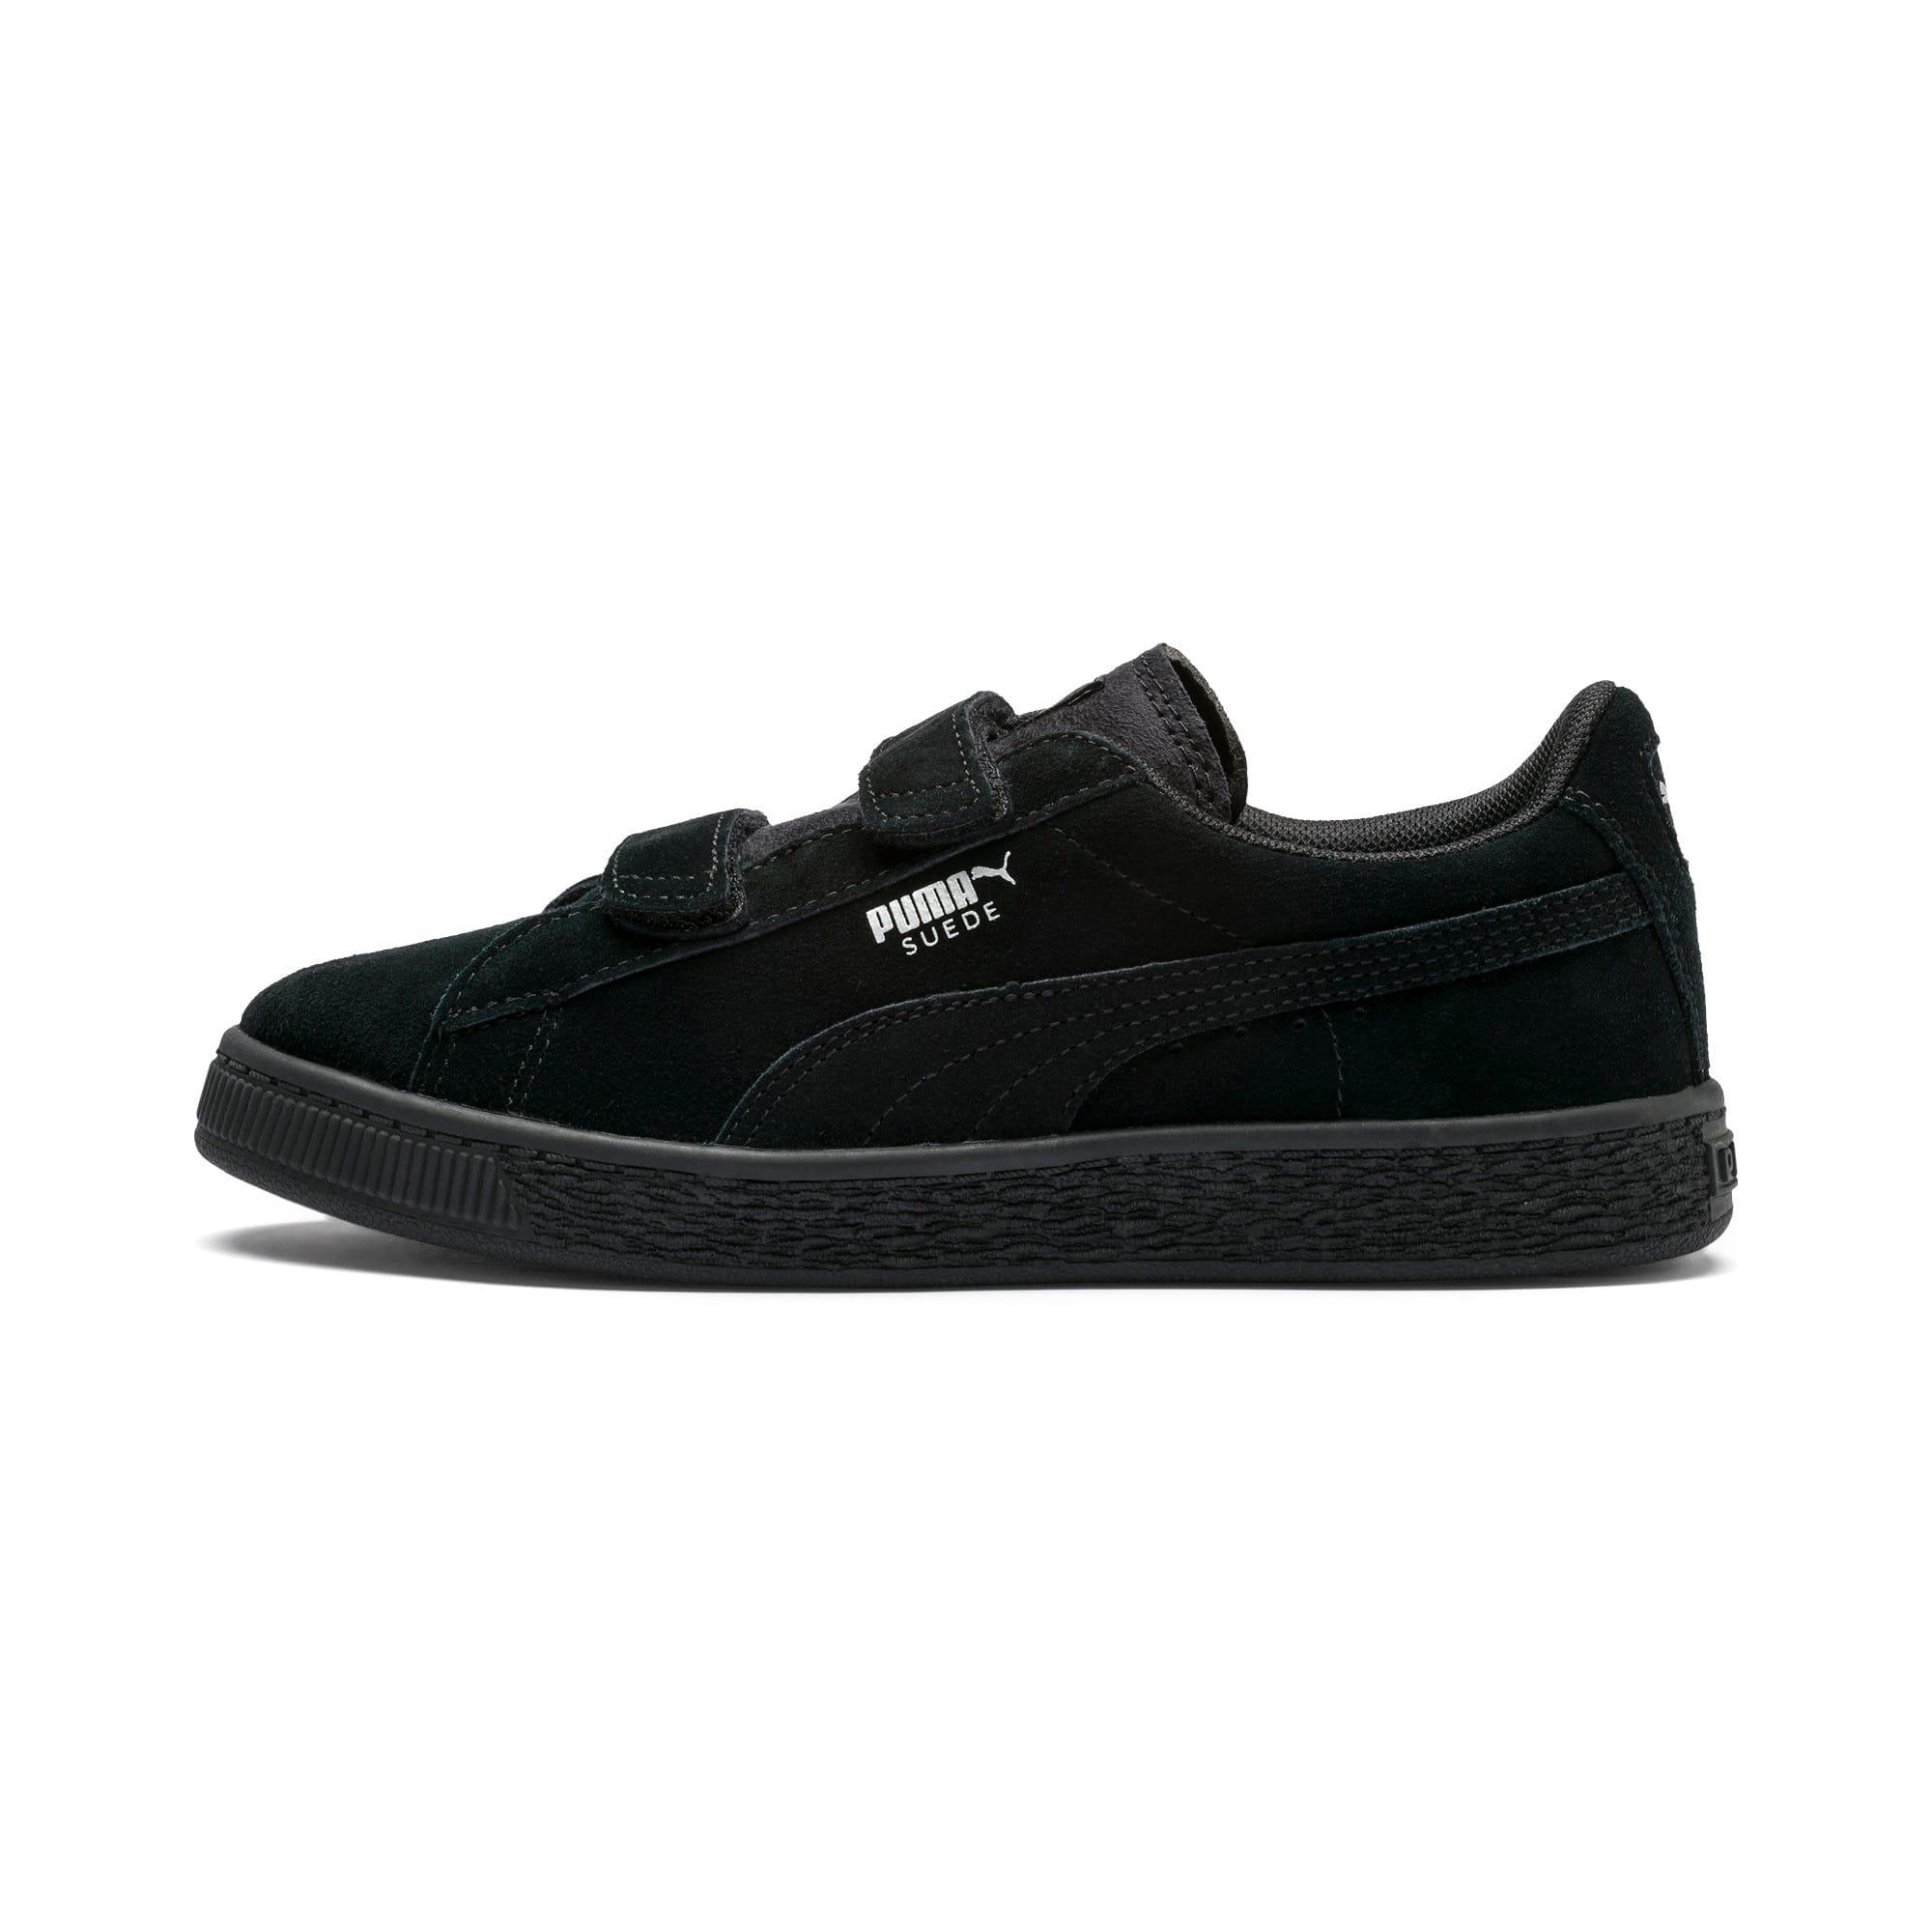 PUMA Suede Classic+, Men's Shoes, (Black 03), 9 UK (43 EU